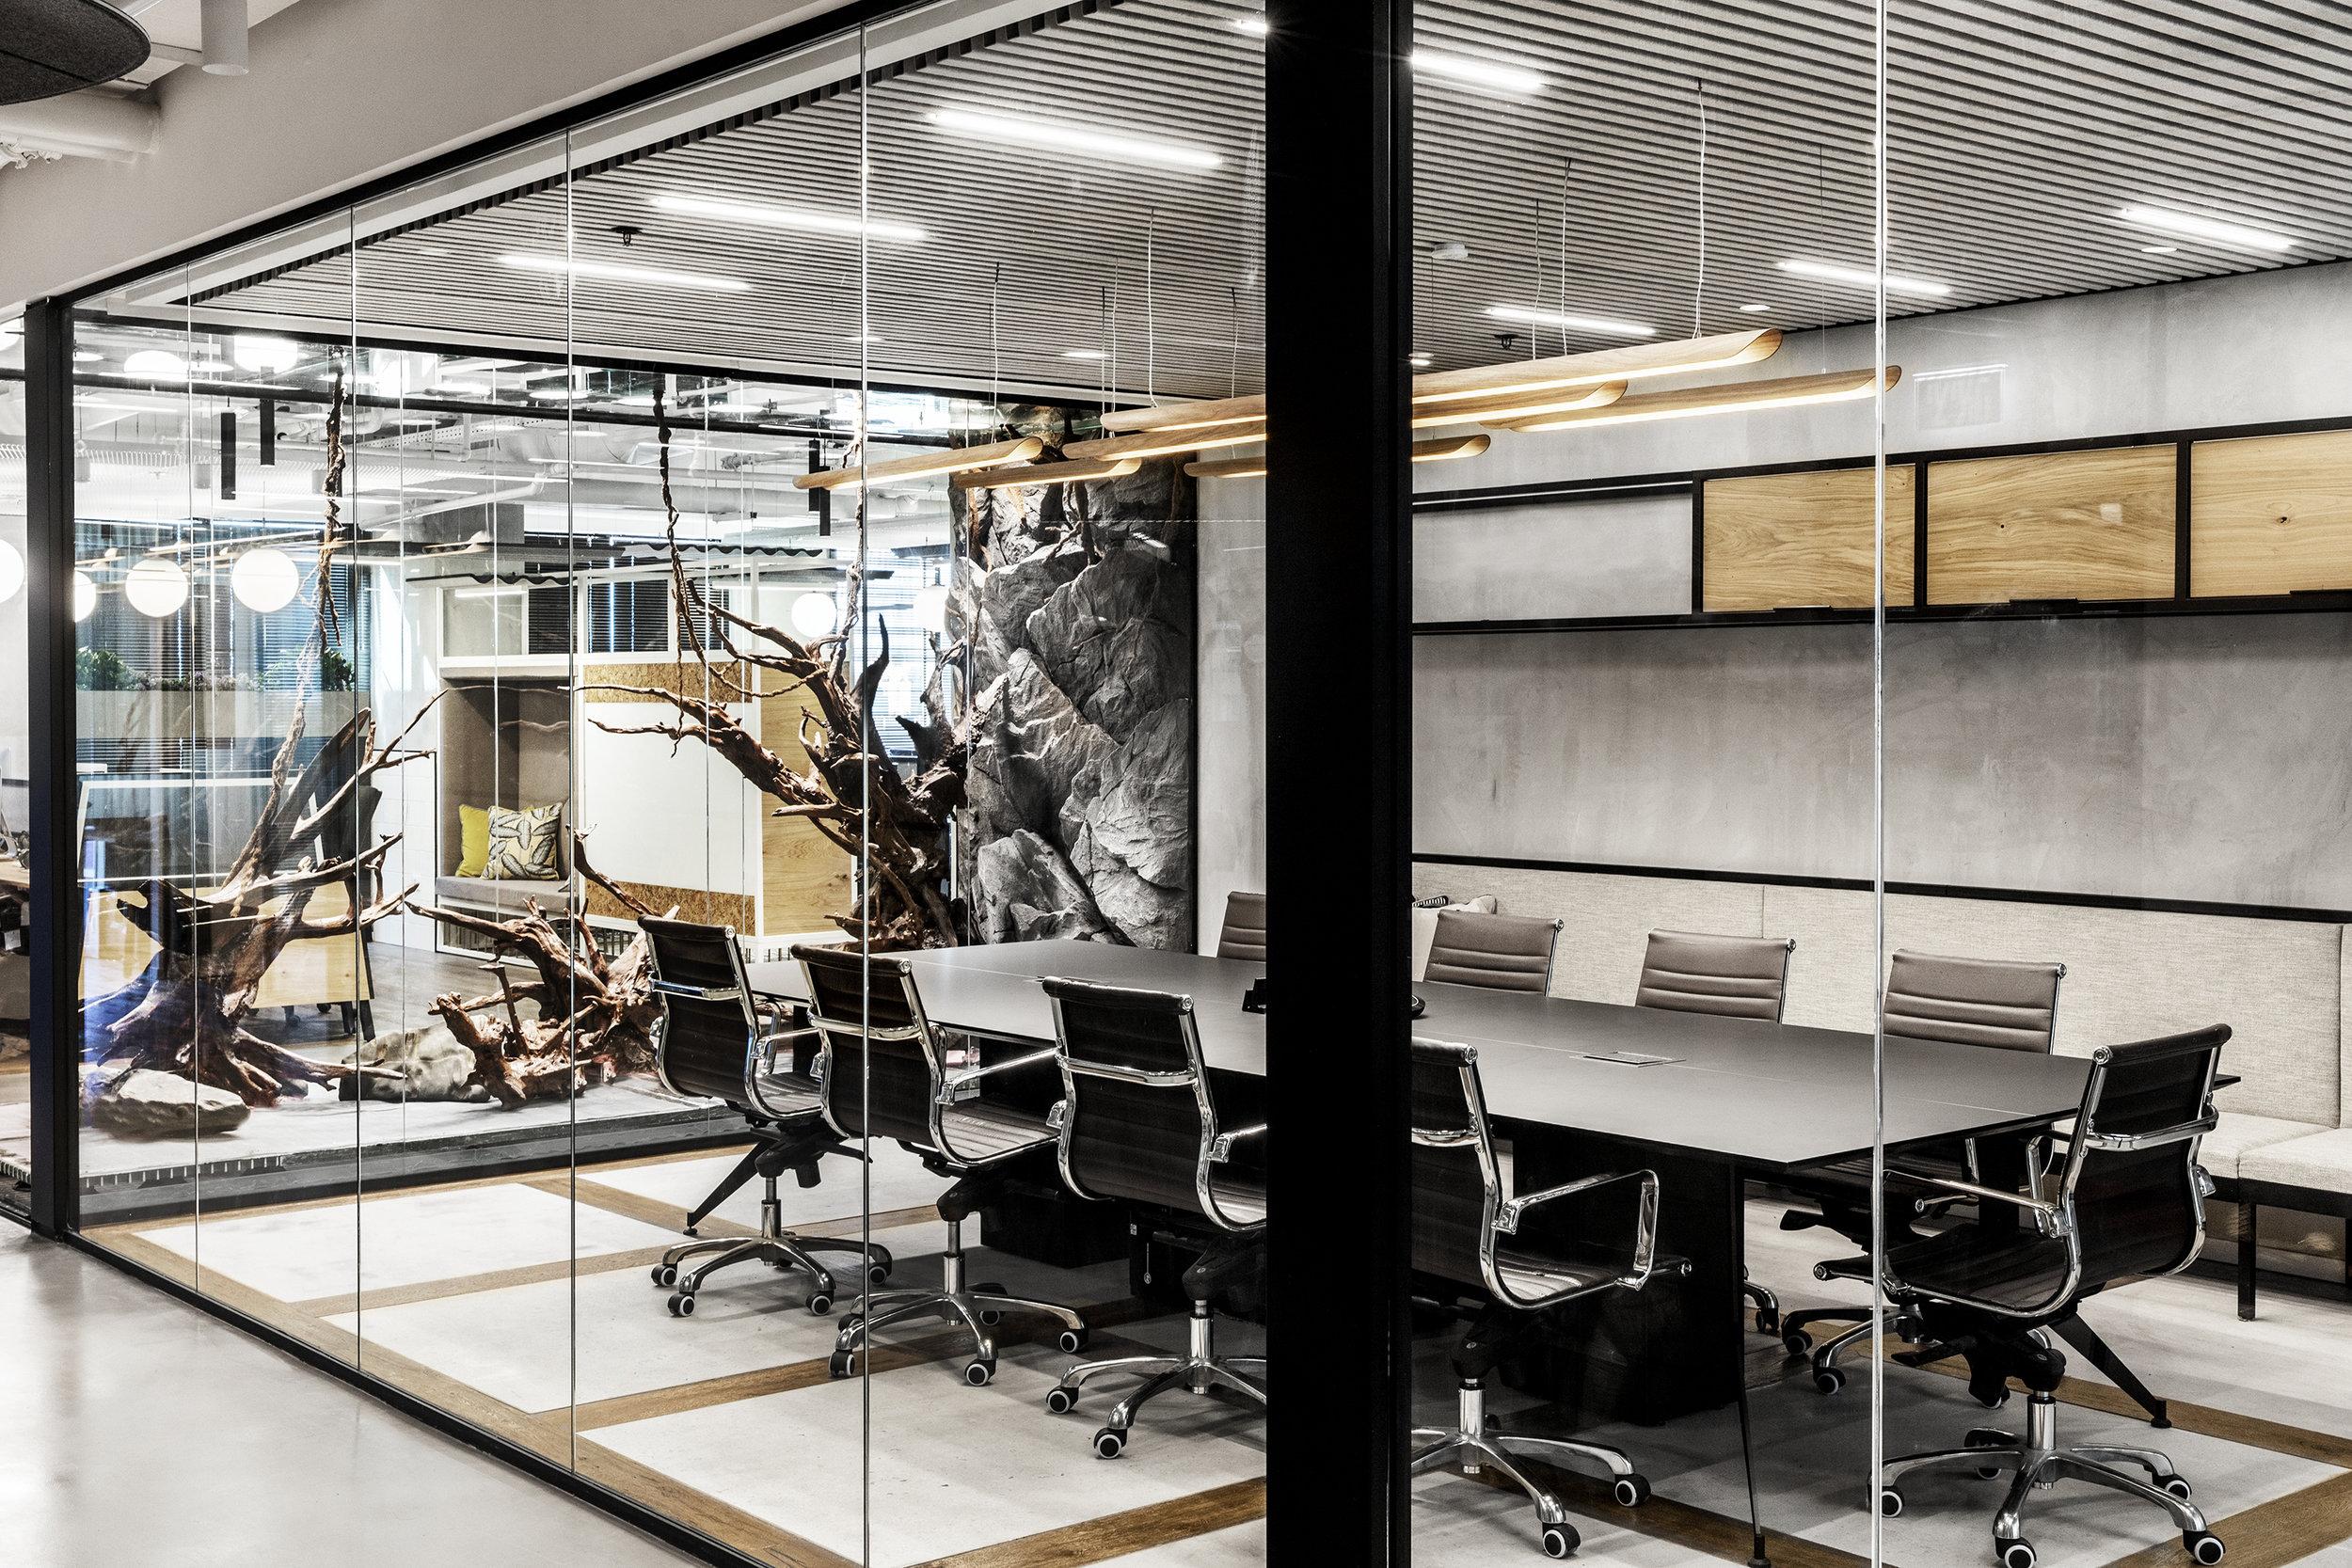 R2NET OFFICES - ROY DAVID ARCHITECTURE  STUDIO - רואי דוד אדריכלות סטודיו אדריכלים - אר2נט (52).jpg